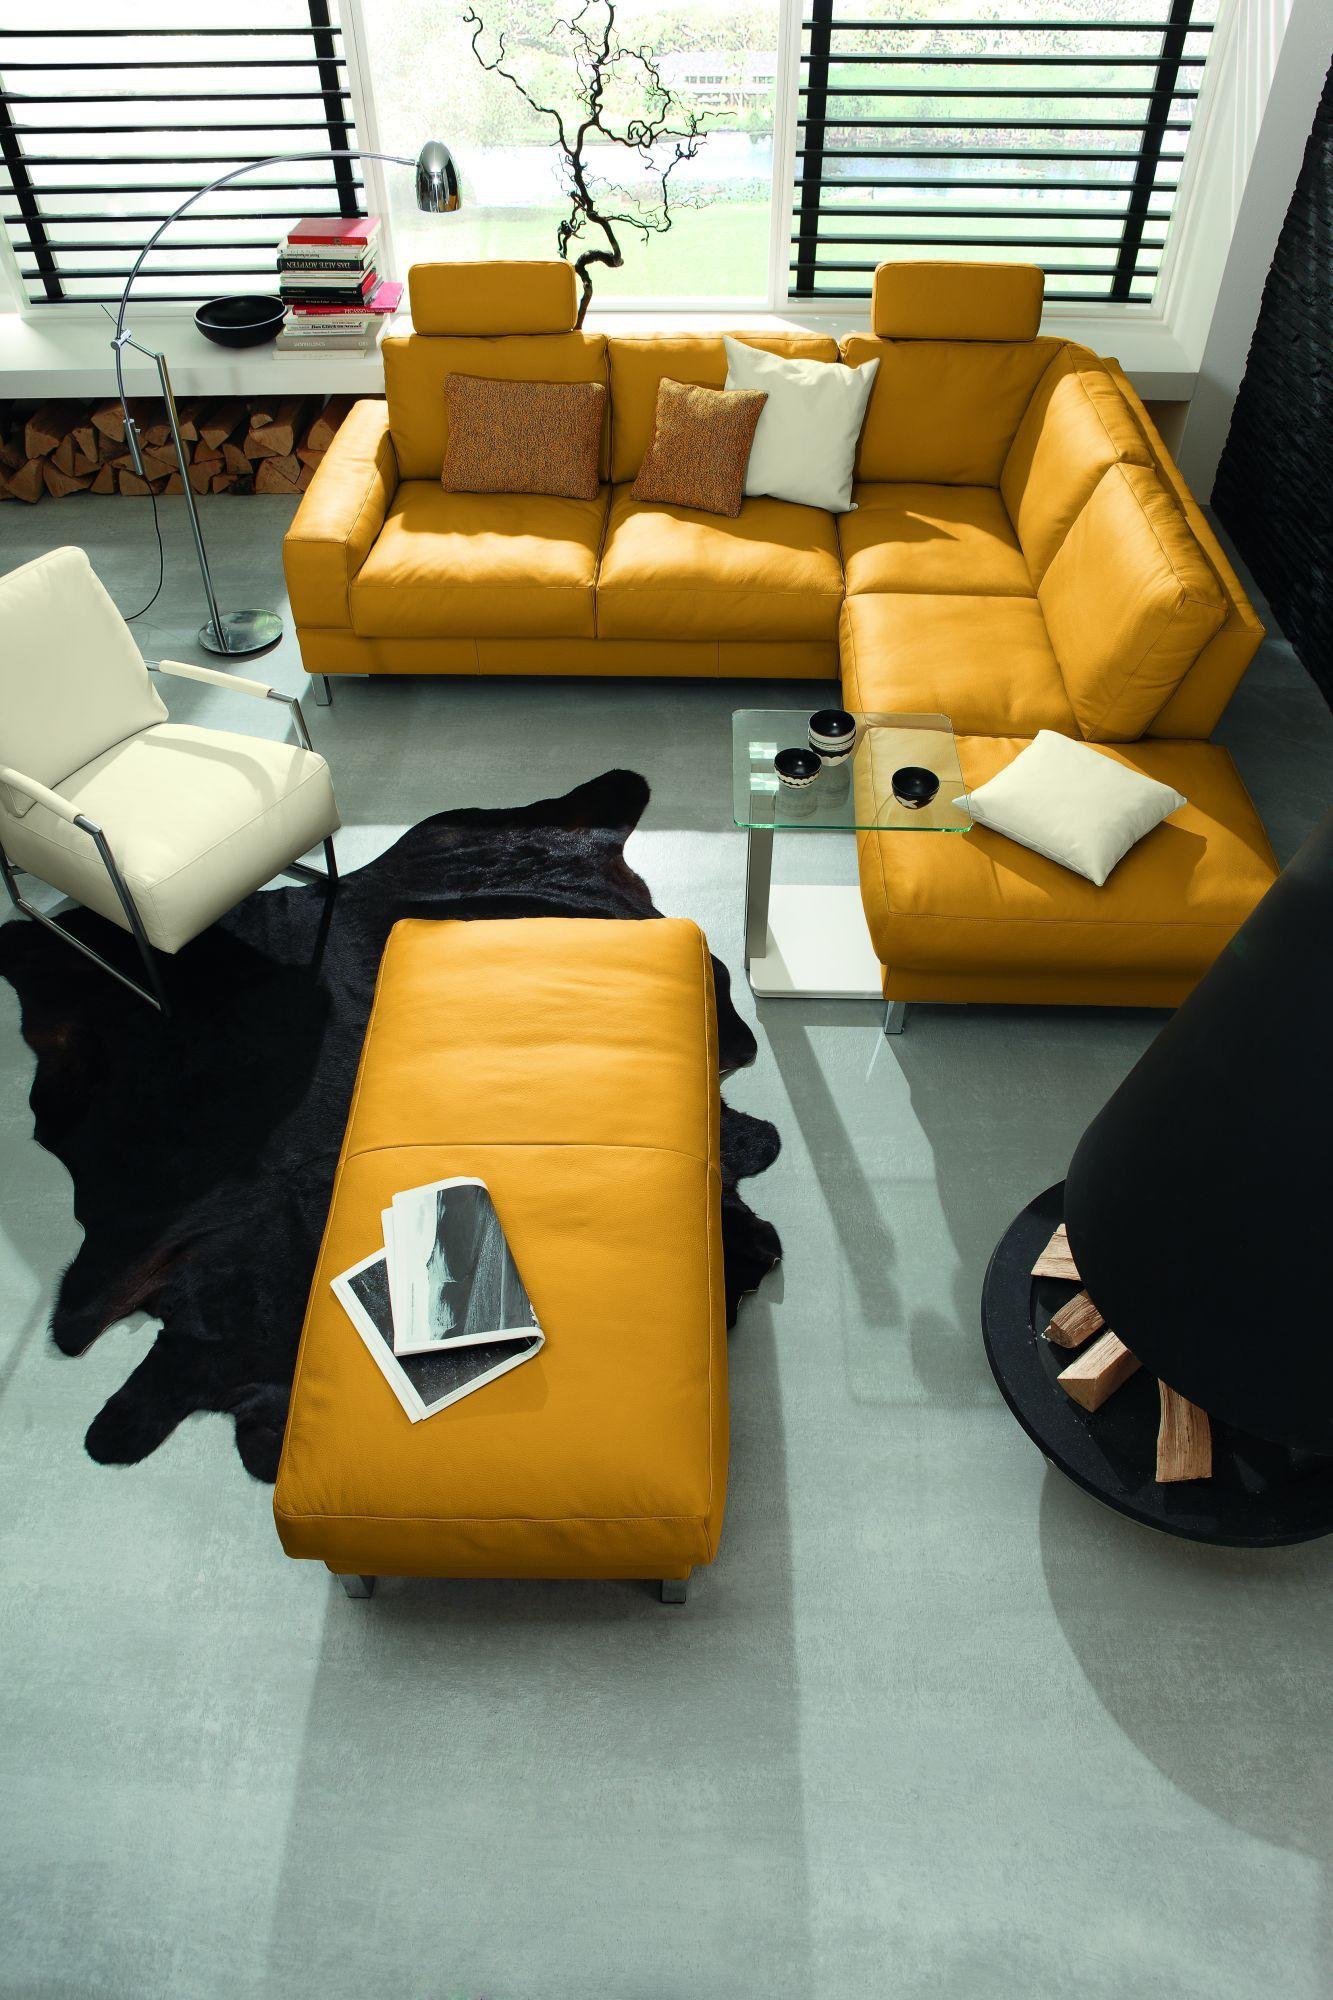 polstergarnitur mr 6040 musterring optiwohnwelt musterring polstergarnitur mr6040 so. Black Bedroom Furniture Sets. Home Design Ideas